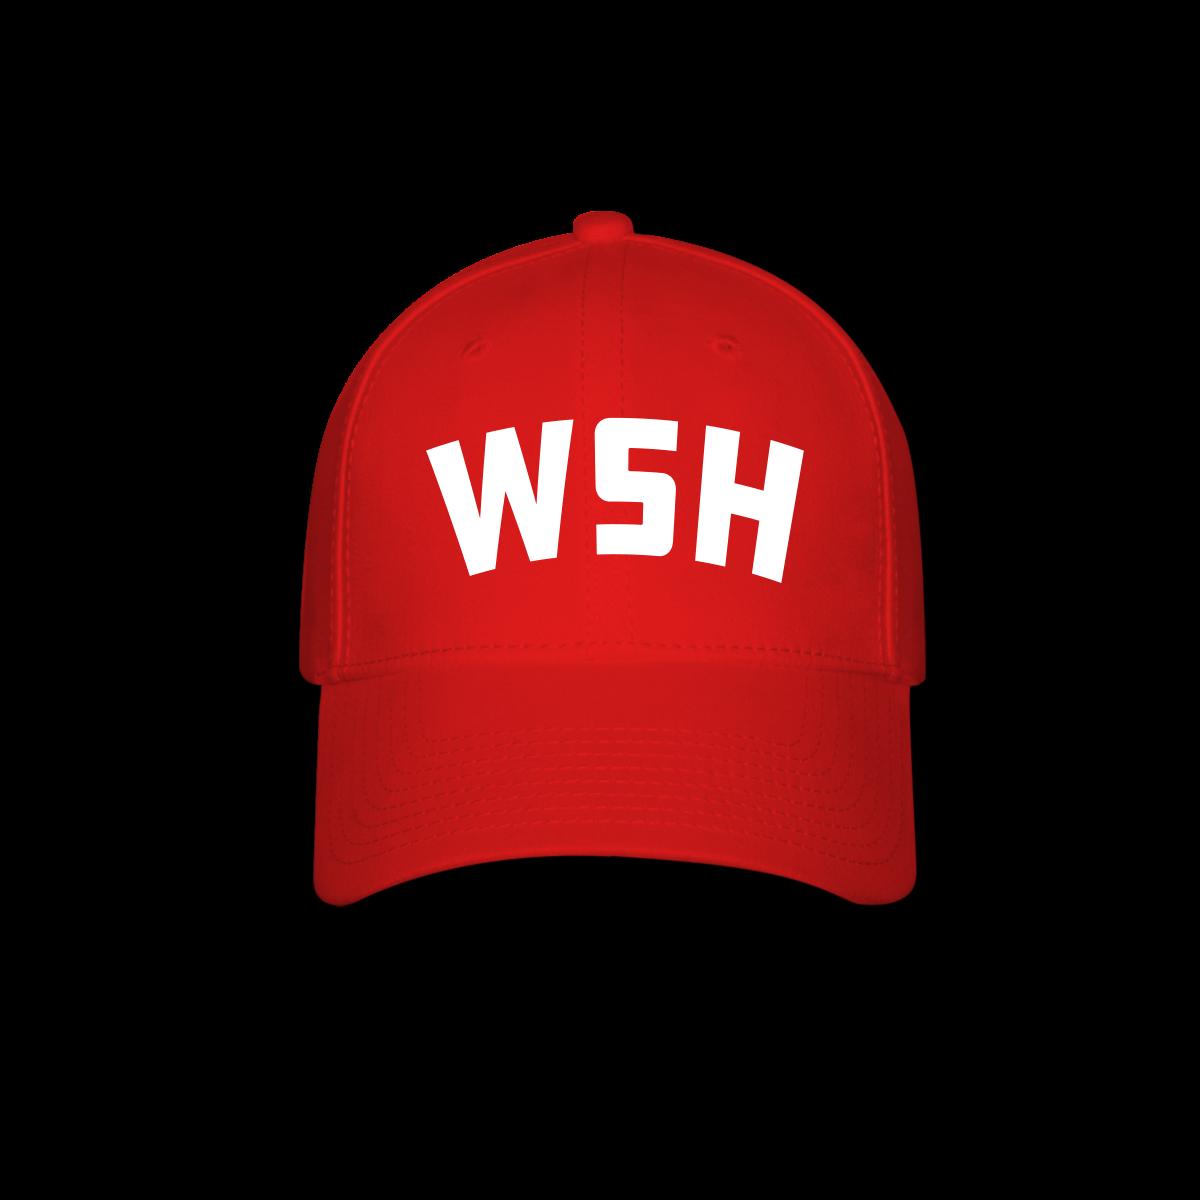 wsh-baseball-hat-baseball-cap.png